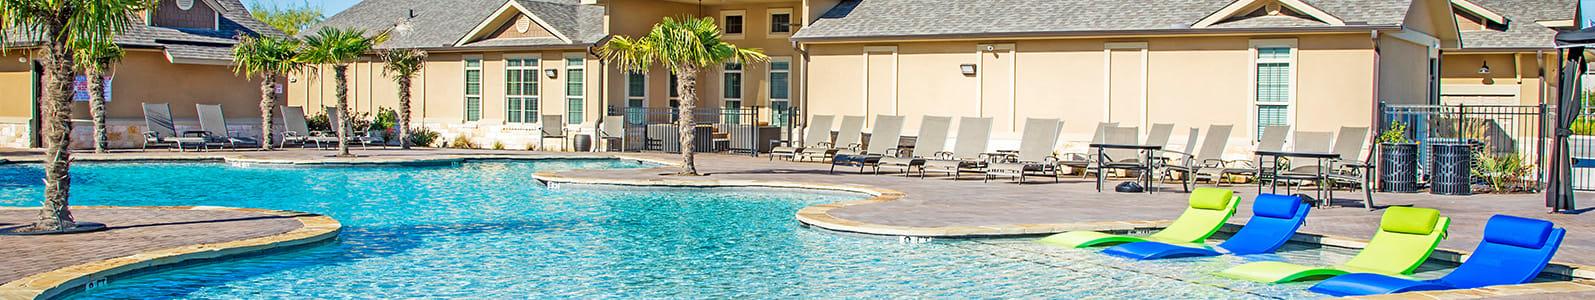 Sparkling Swimming Pool at Arrington Ridge, Round Rock, TX